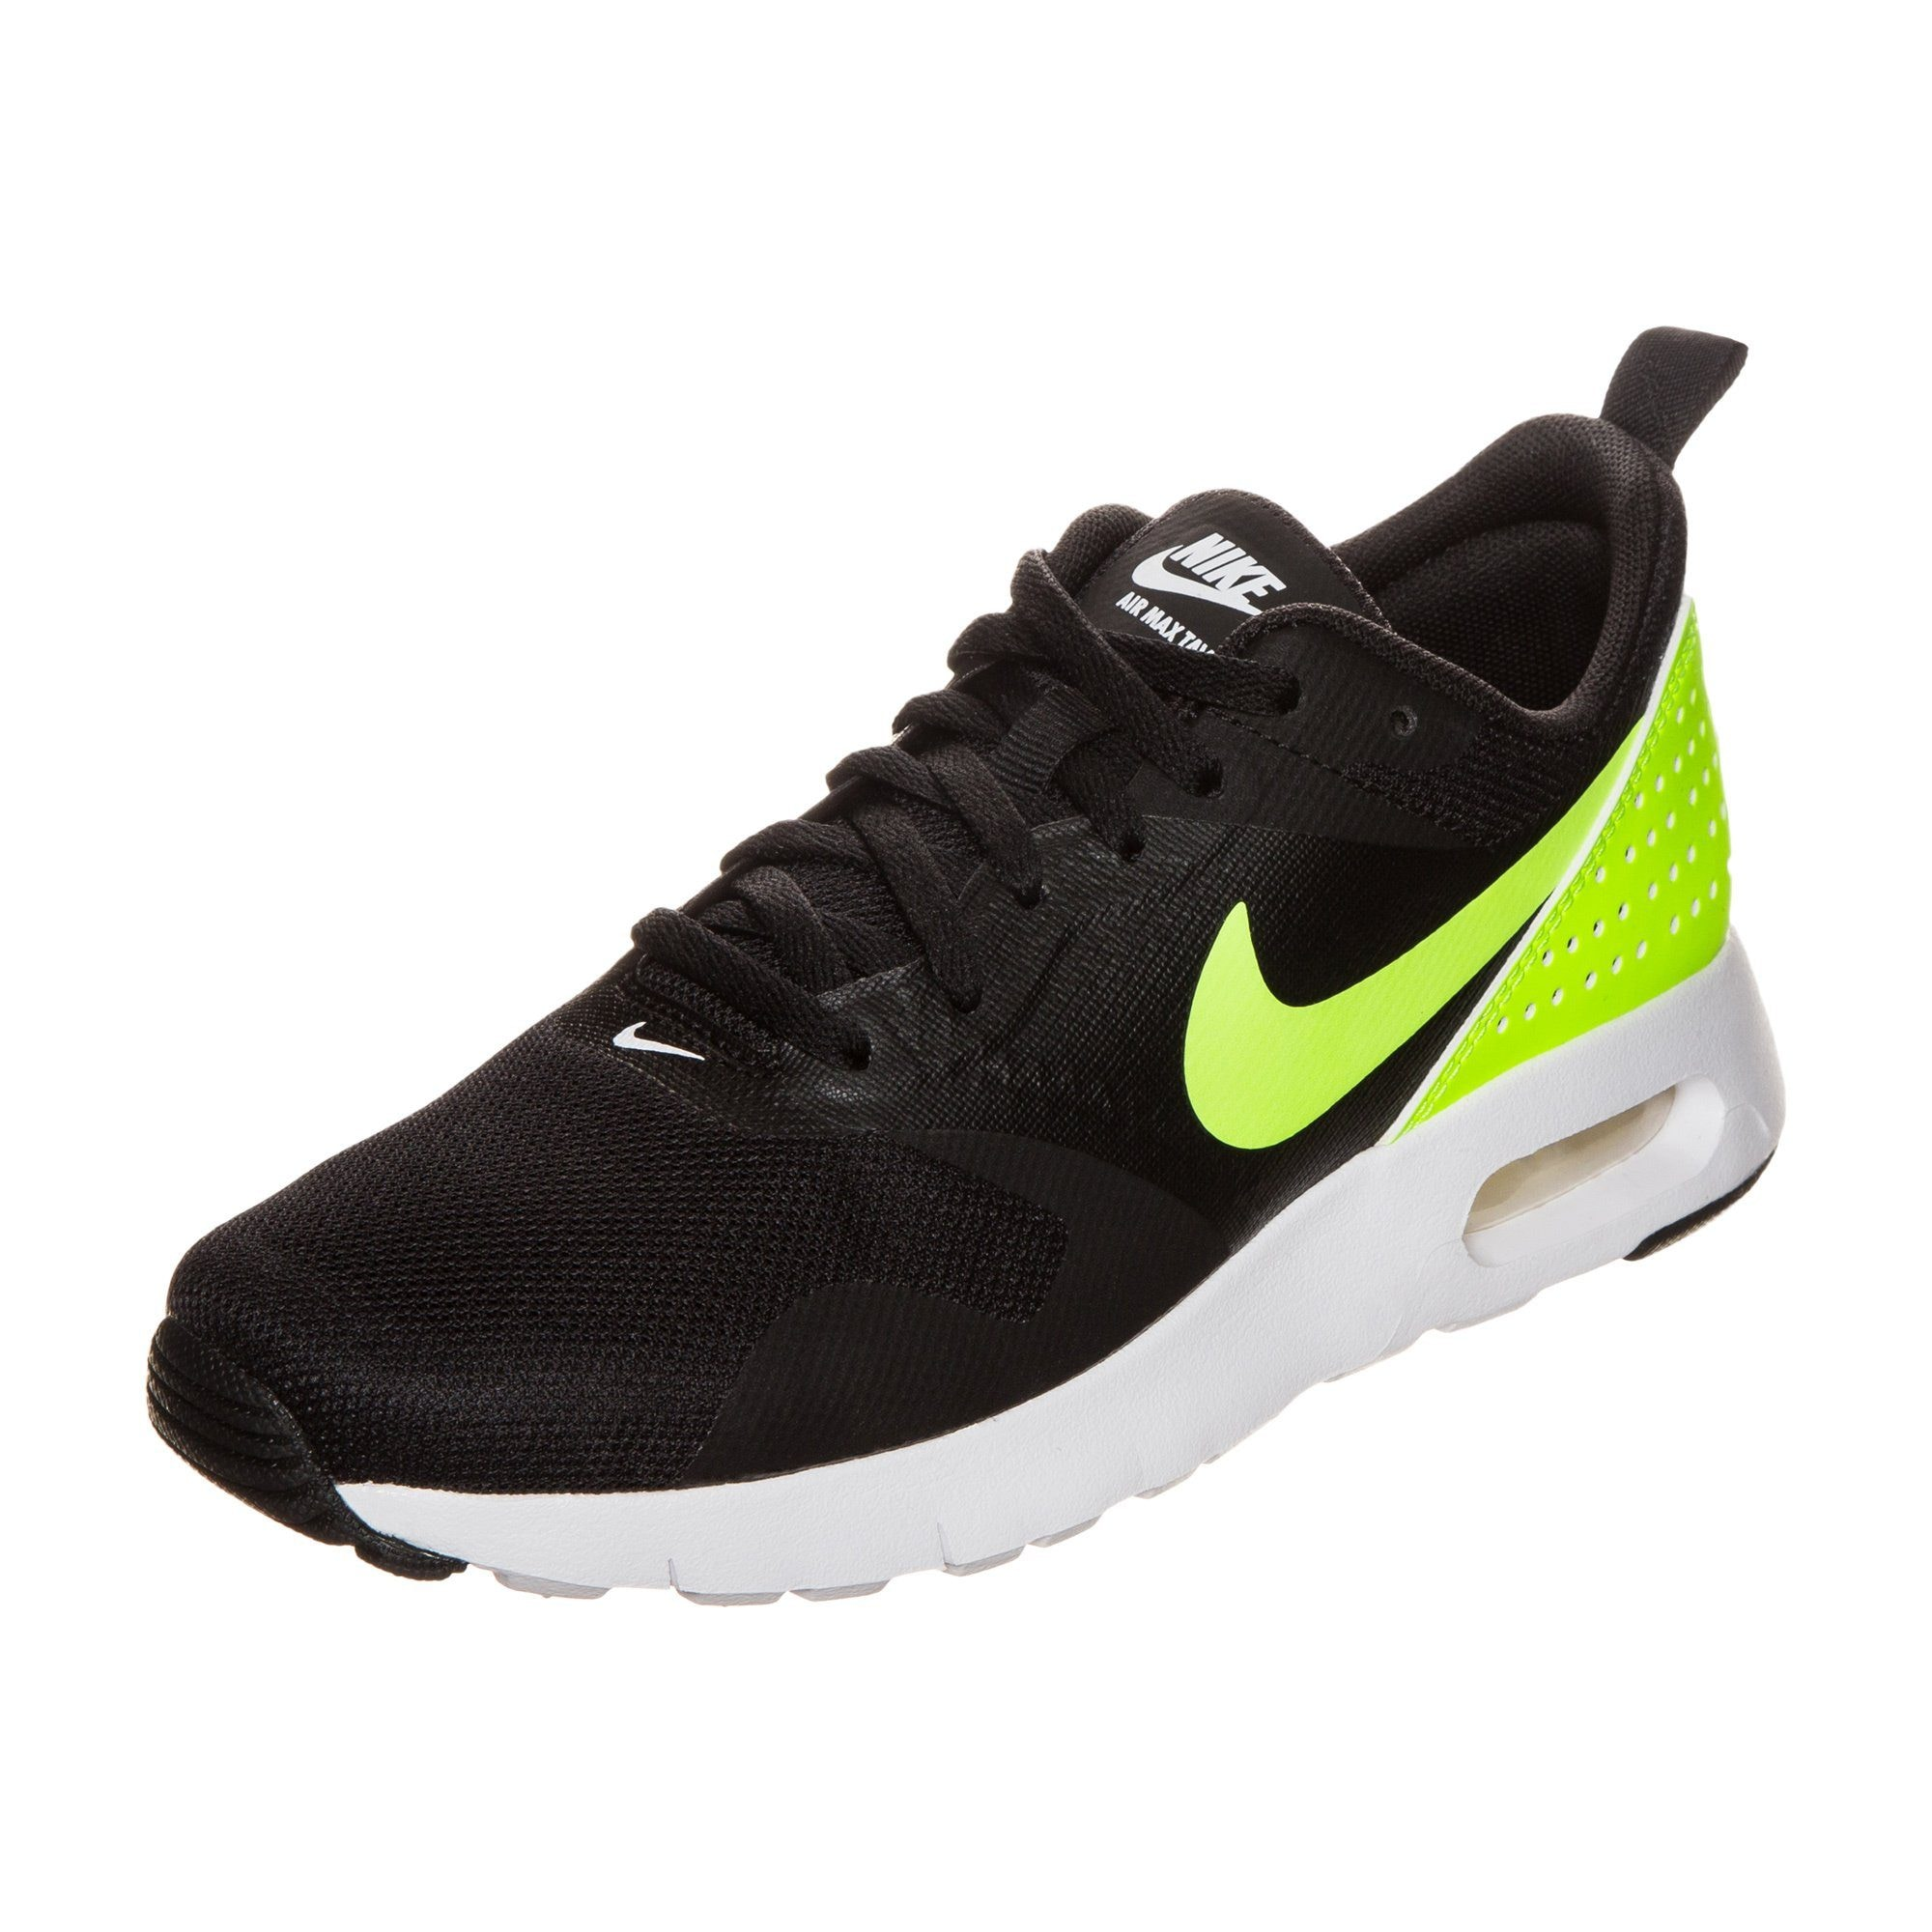 Nike Air Max Tavas Herren Sneaker TealWhiteBlack | Fun